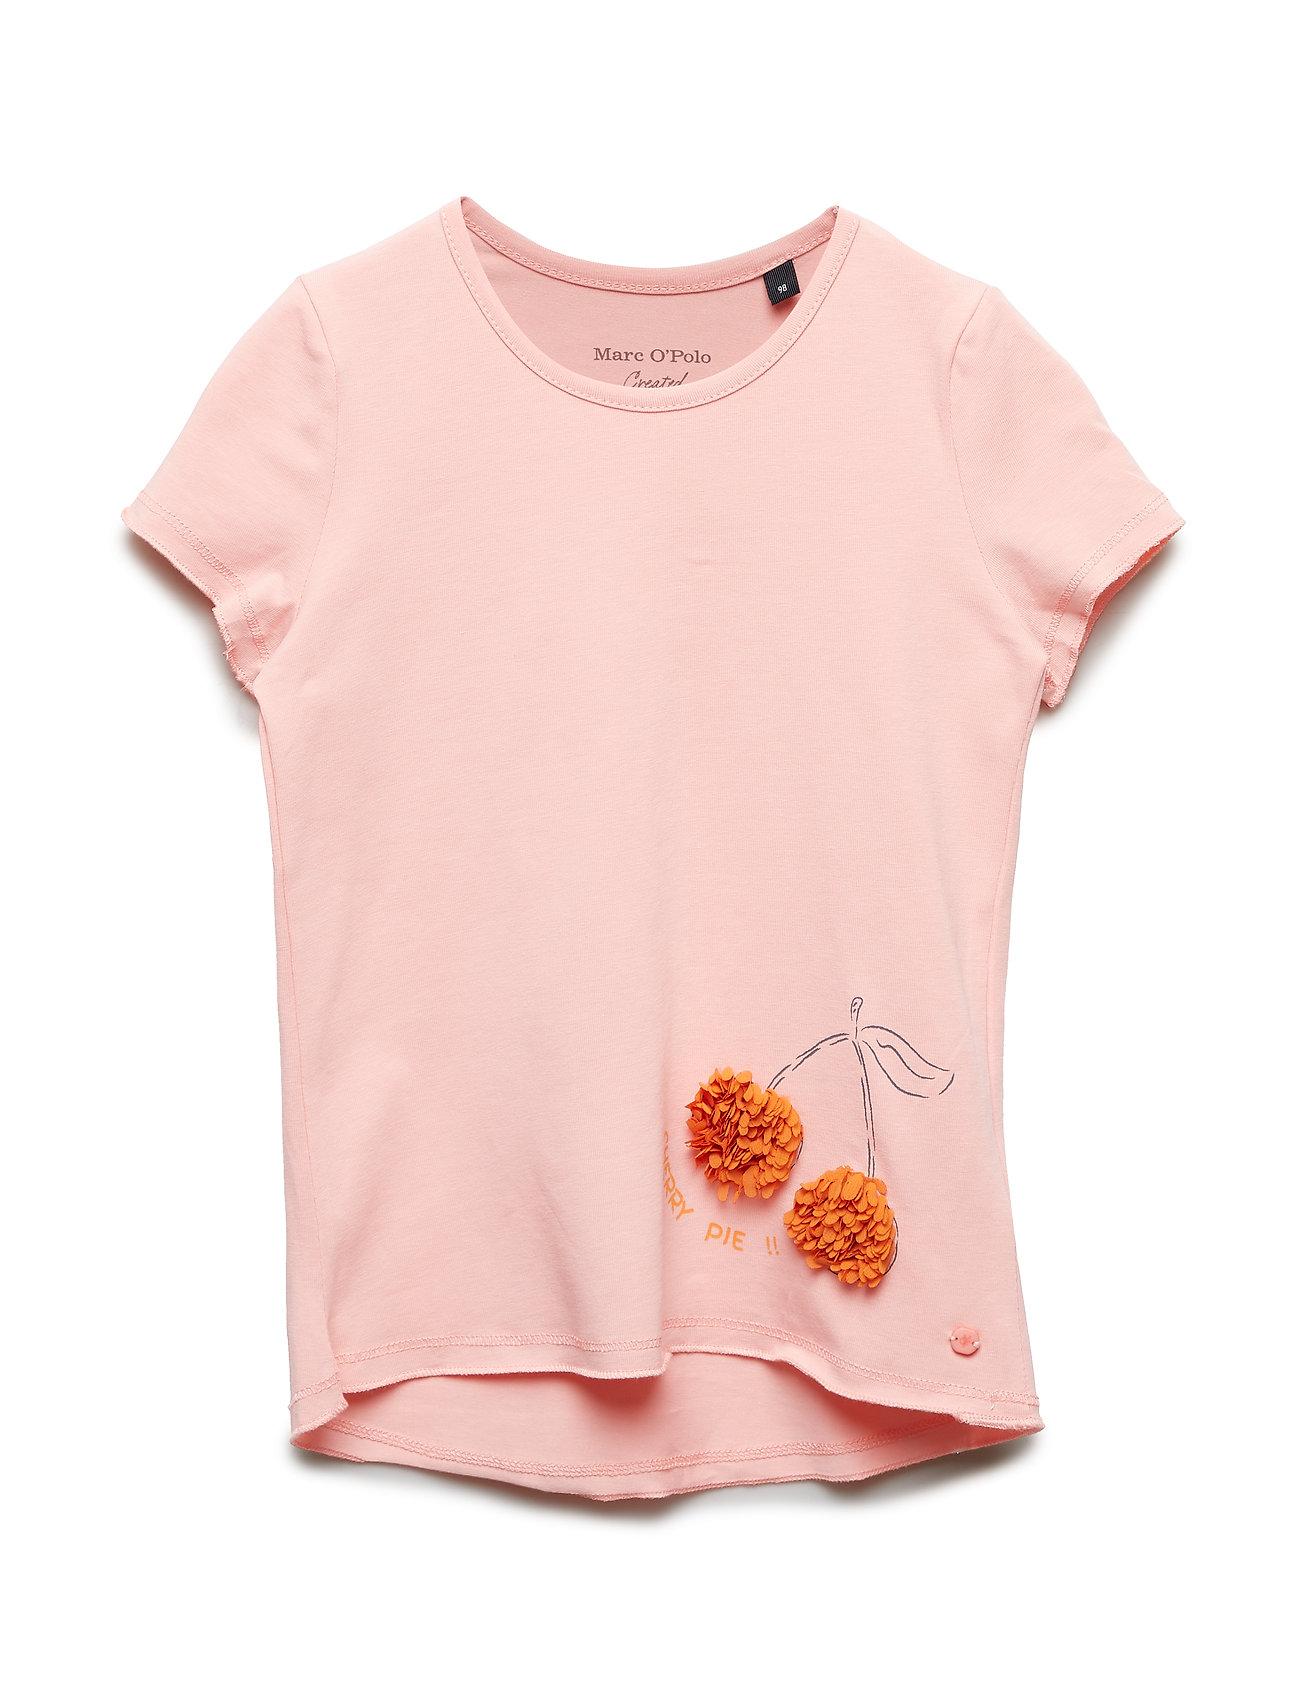 2530da4eb T-shirt 1 4 Arm (Candlelight Peach-rose) (£20.30) - Marc O Polo ...